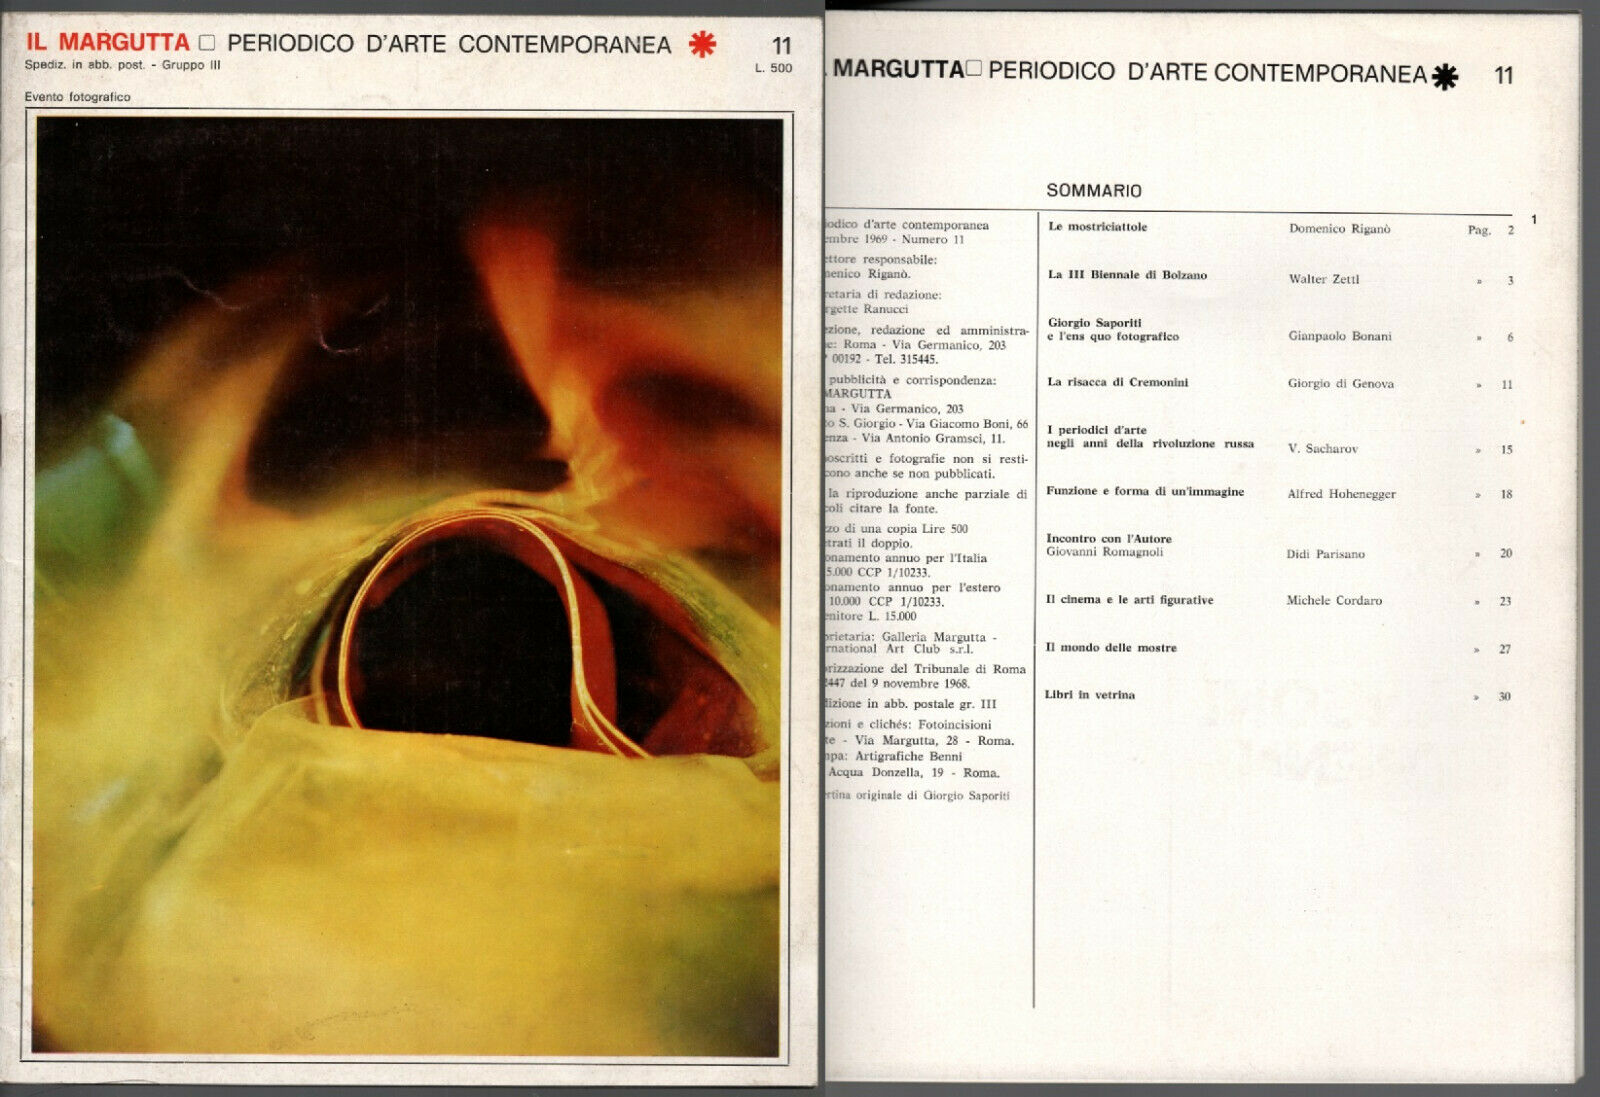 Catalogo Christie's british and continental glass and ceramics 1990